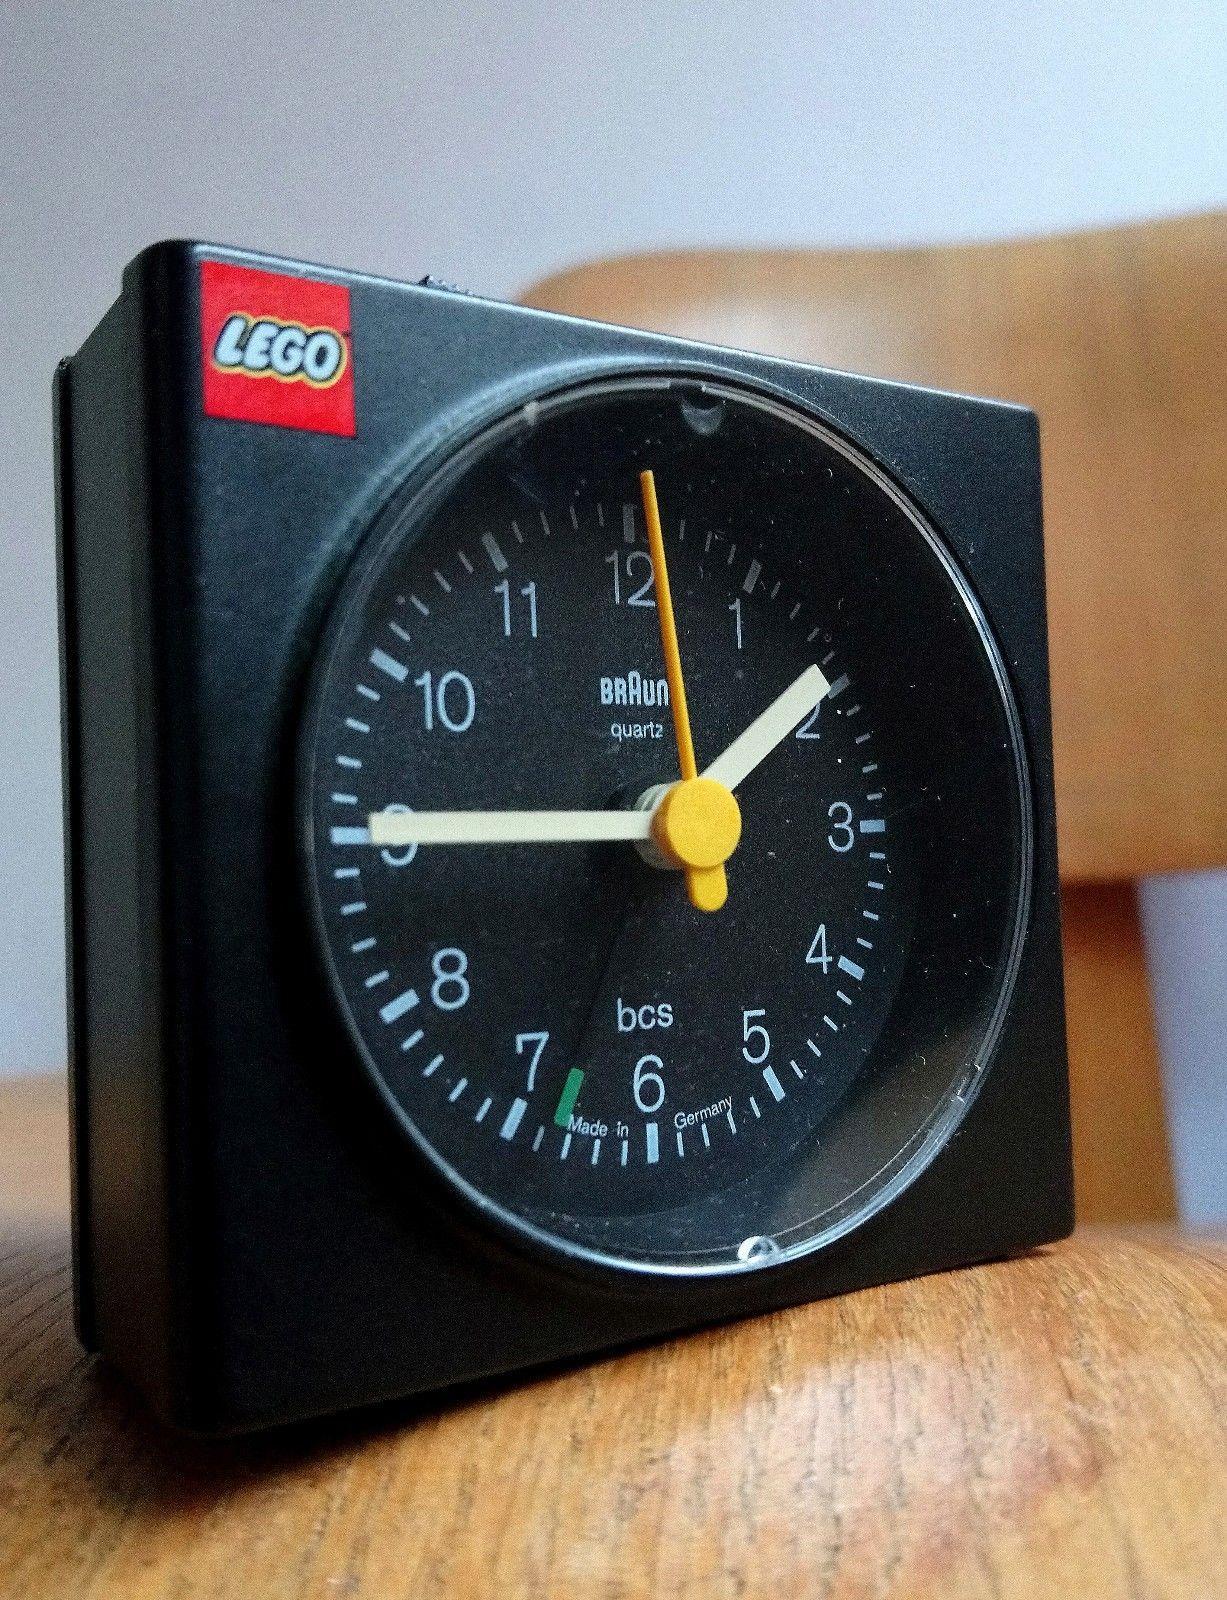 Rare Braun Ab 7 Quartz Alarm Clock For Lego Lubs Dieter Rams Modernist Design Ebay Lego Design